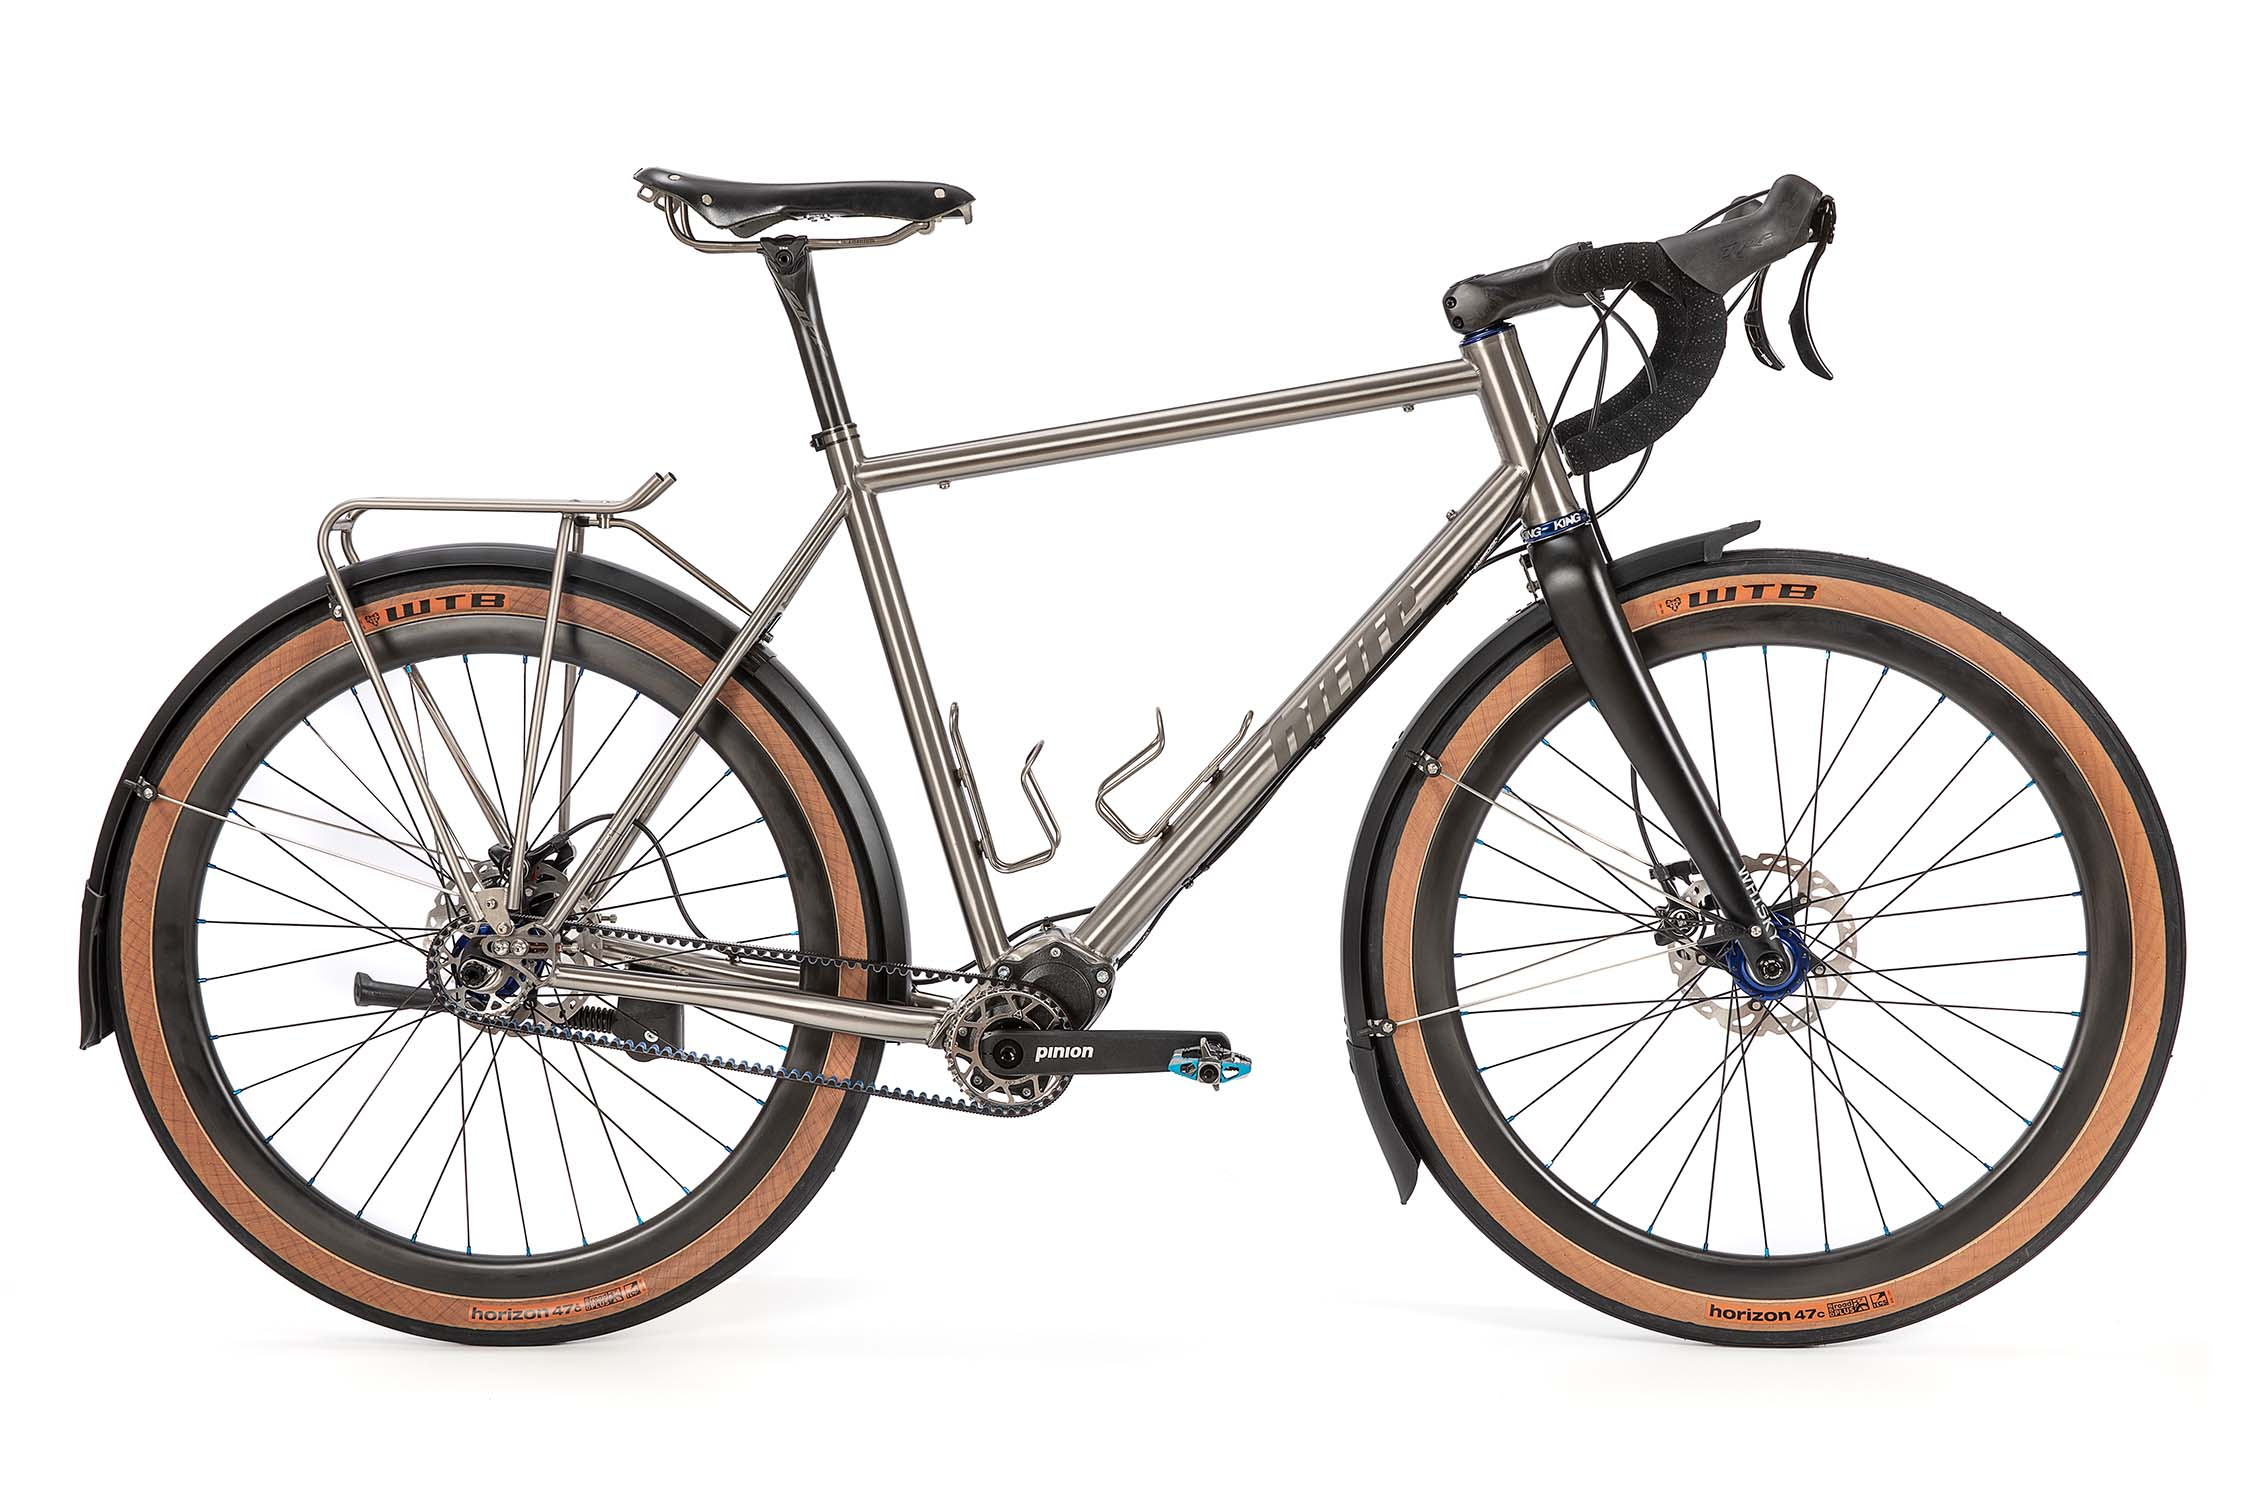 Pinion Getriebe Fahrrad mit Gates Carbon Drive– jetzt bei uns in Basel testen